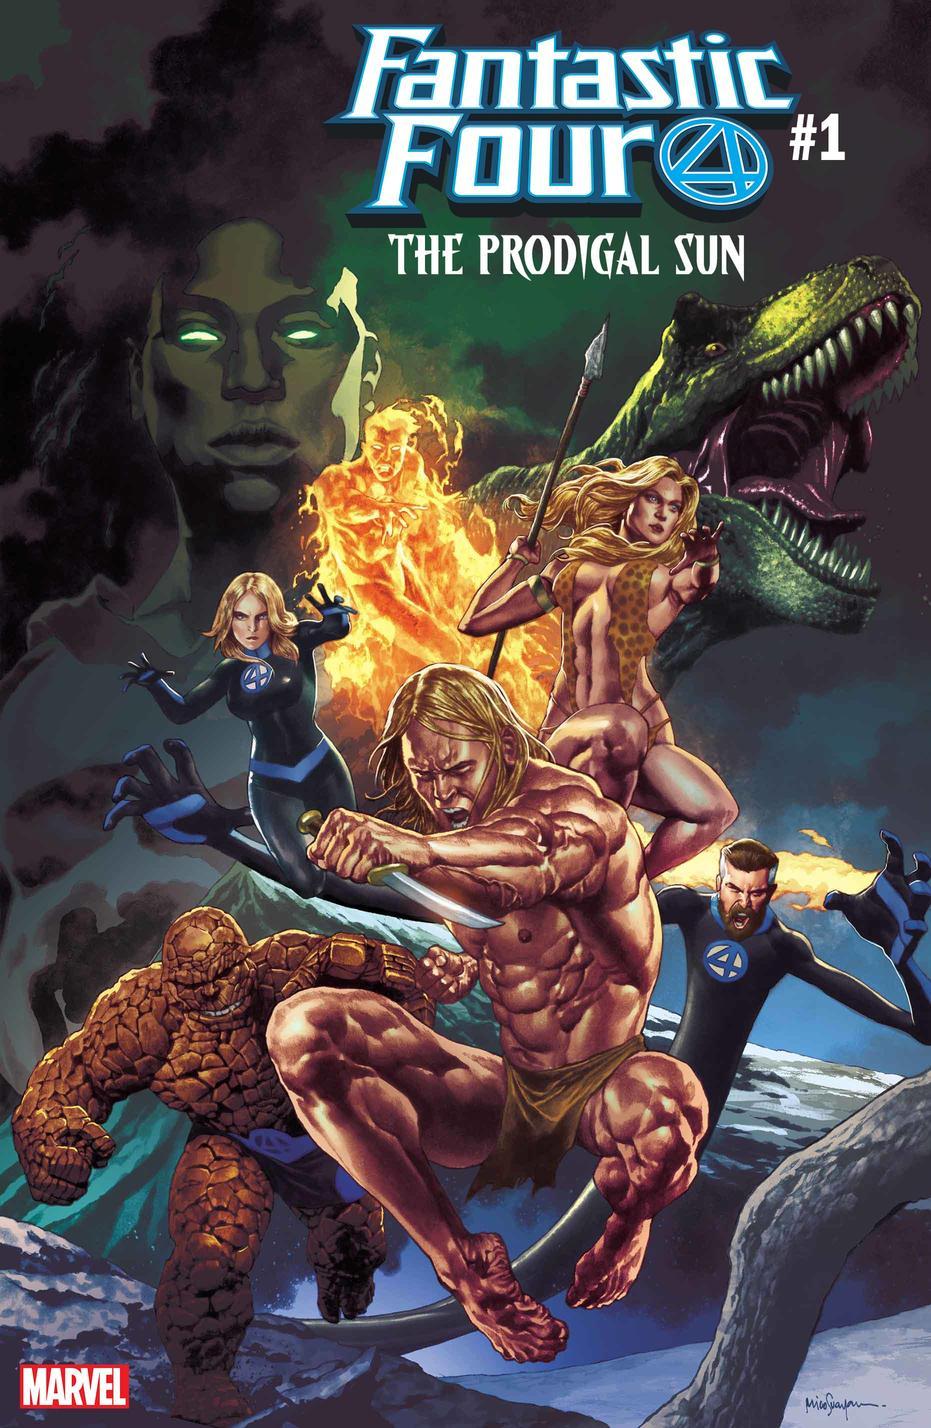 Fantastic Four The Prodigal Sun #1, copertina di Mico Suayan